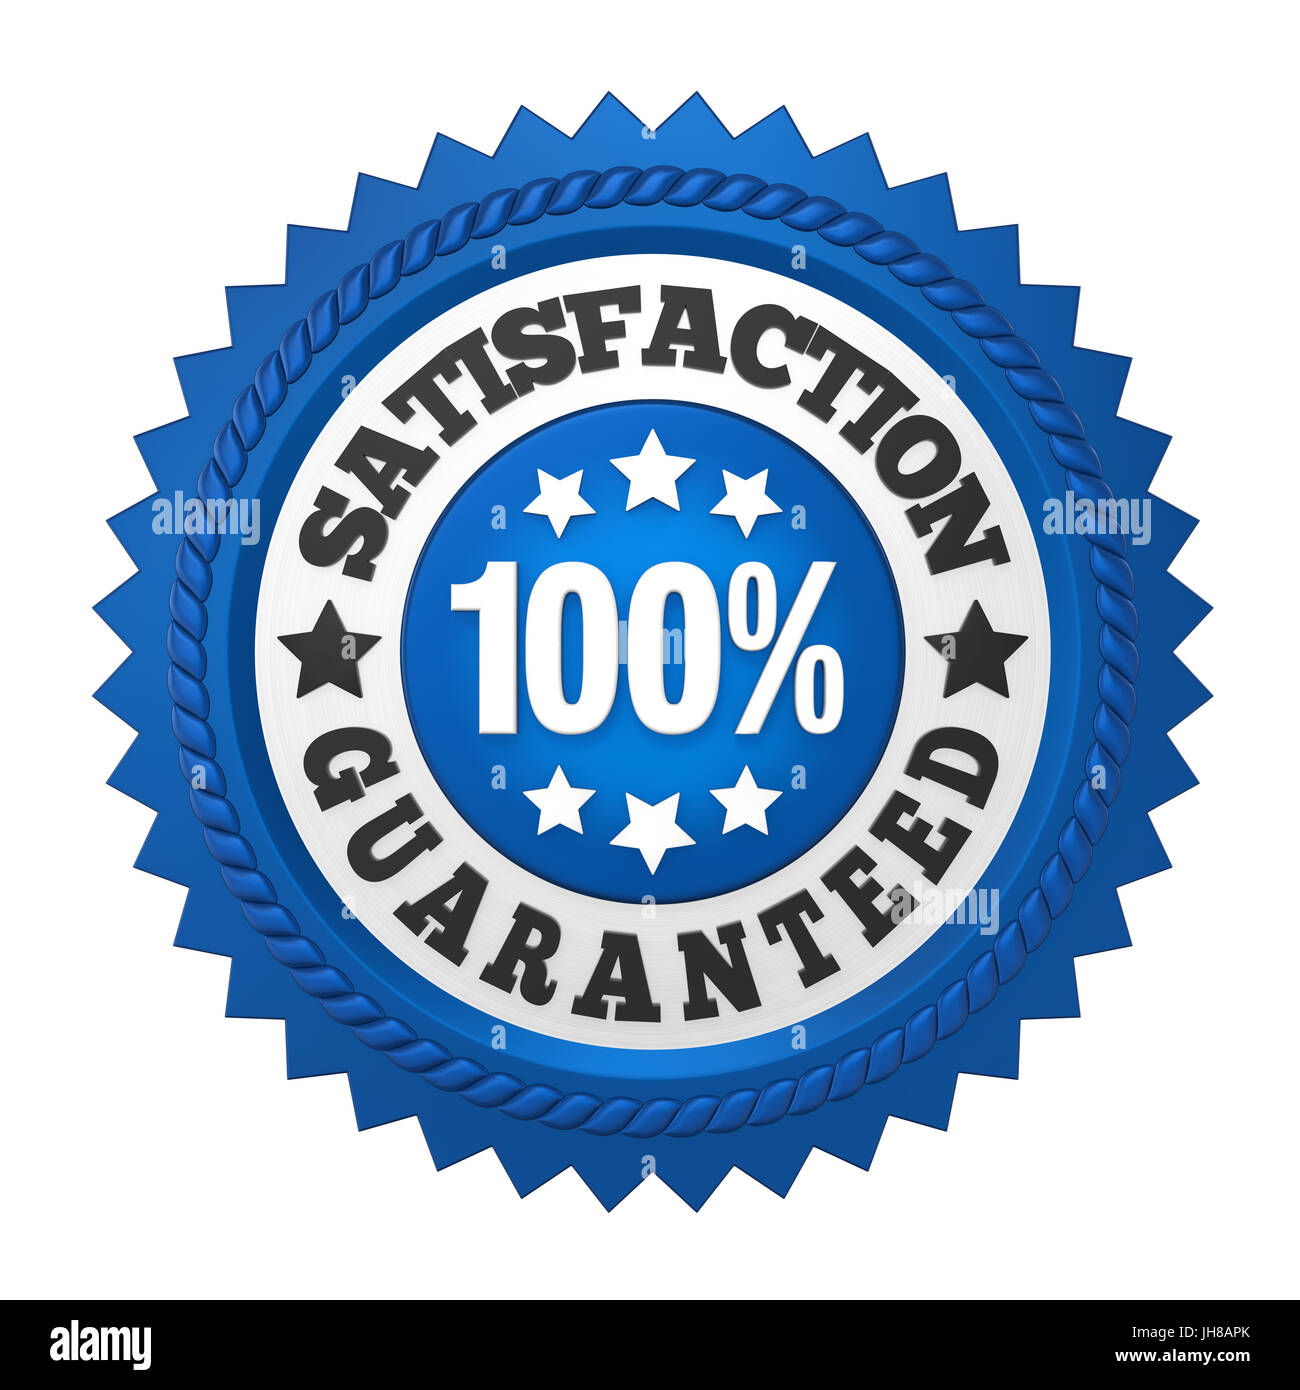 Satisfaction Guaranteed Label Isolated - Stock Image